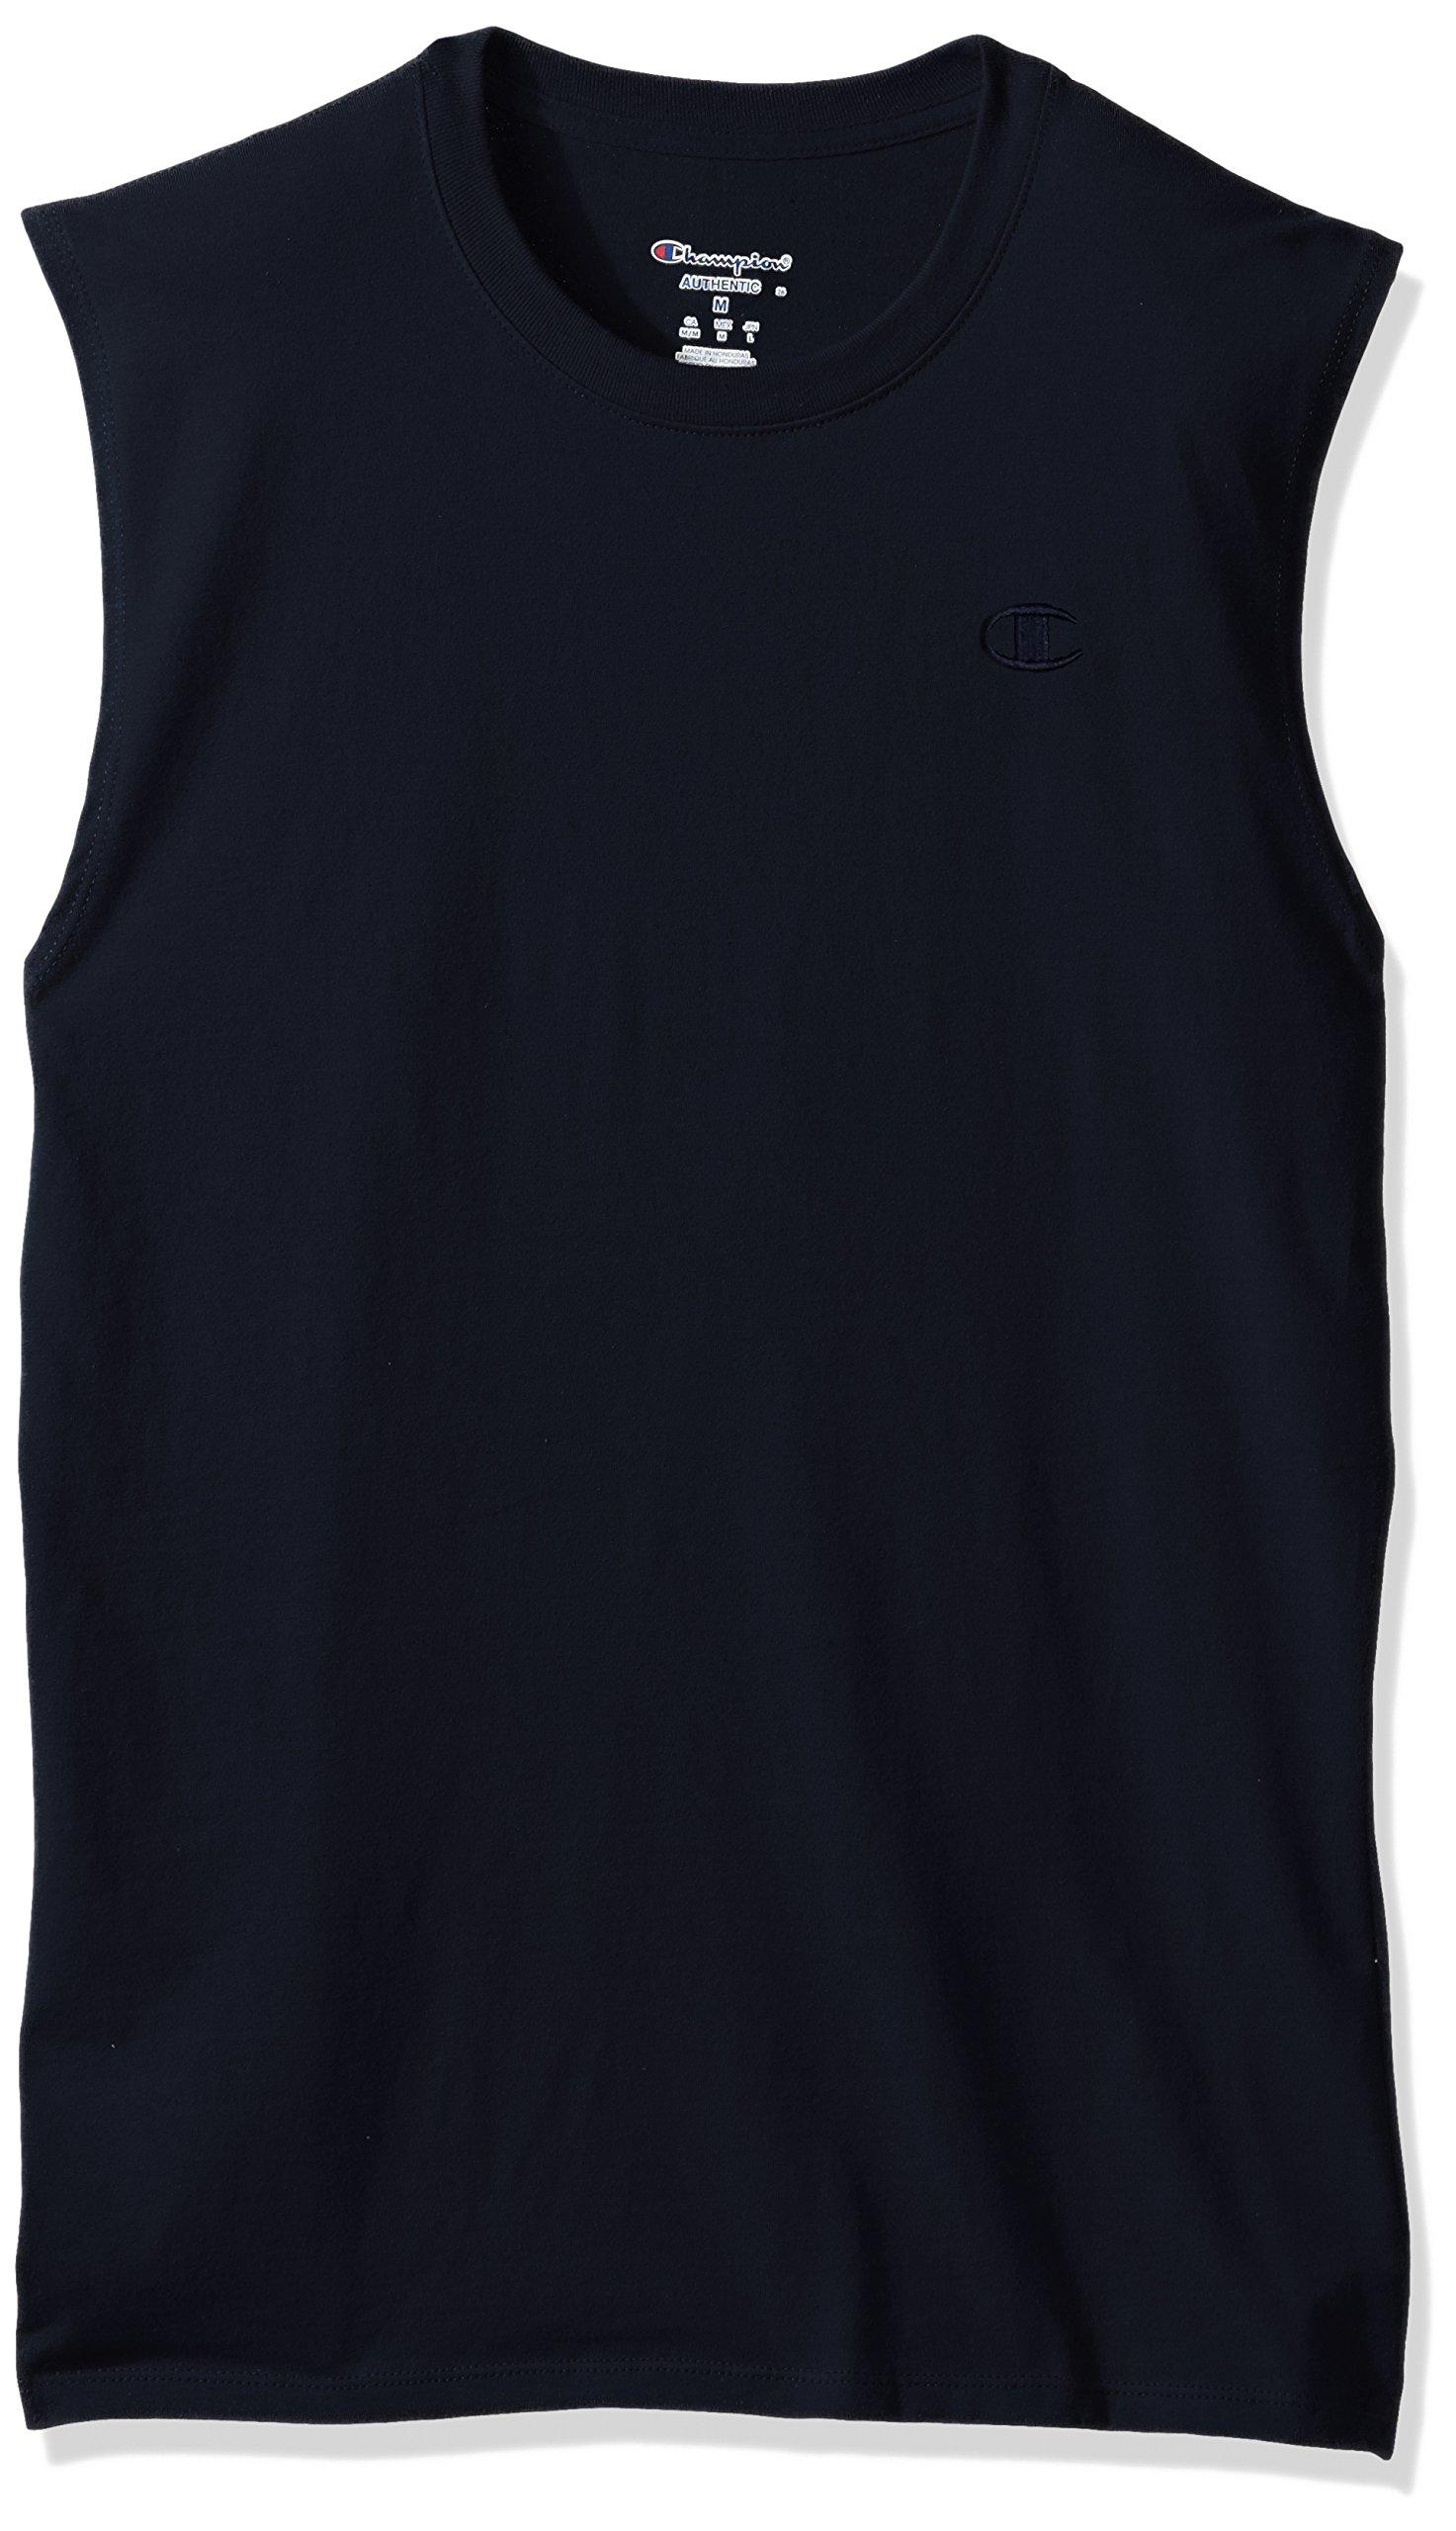 Champion Men's Classic Jersey Muscle T-Shirt, Navy, 2XL